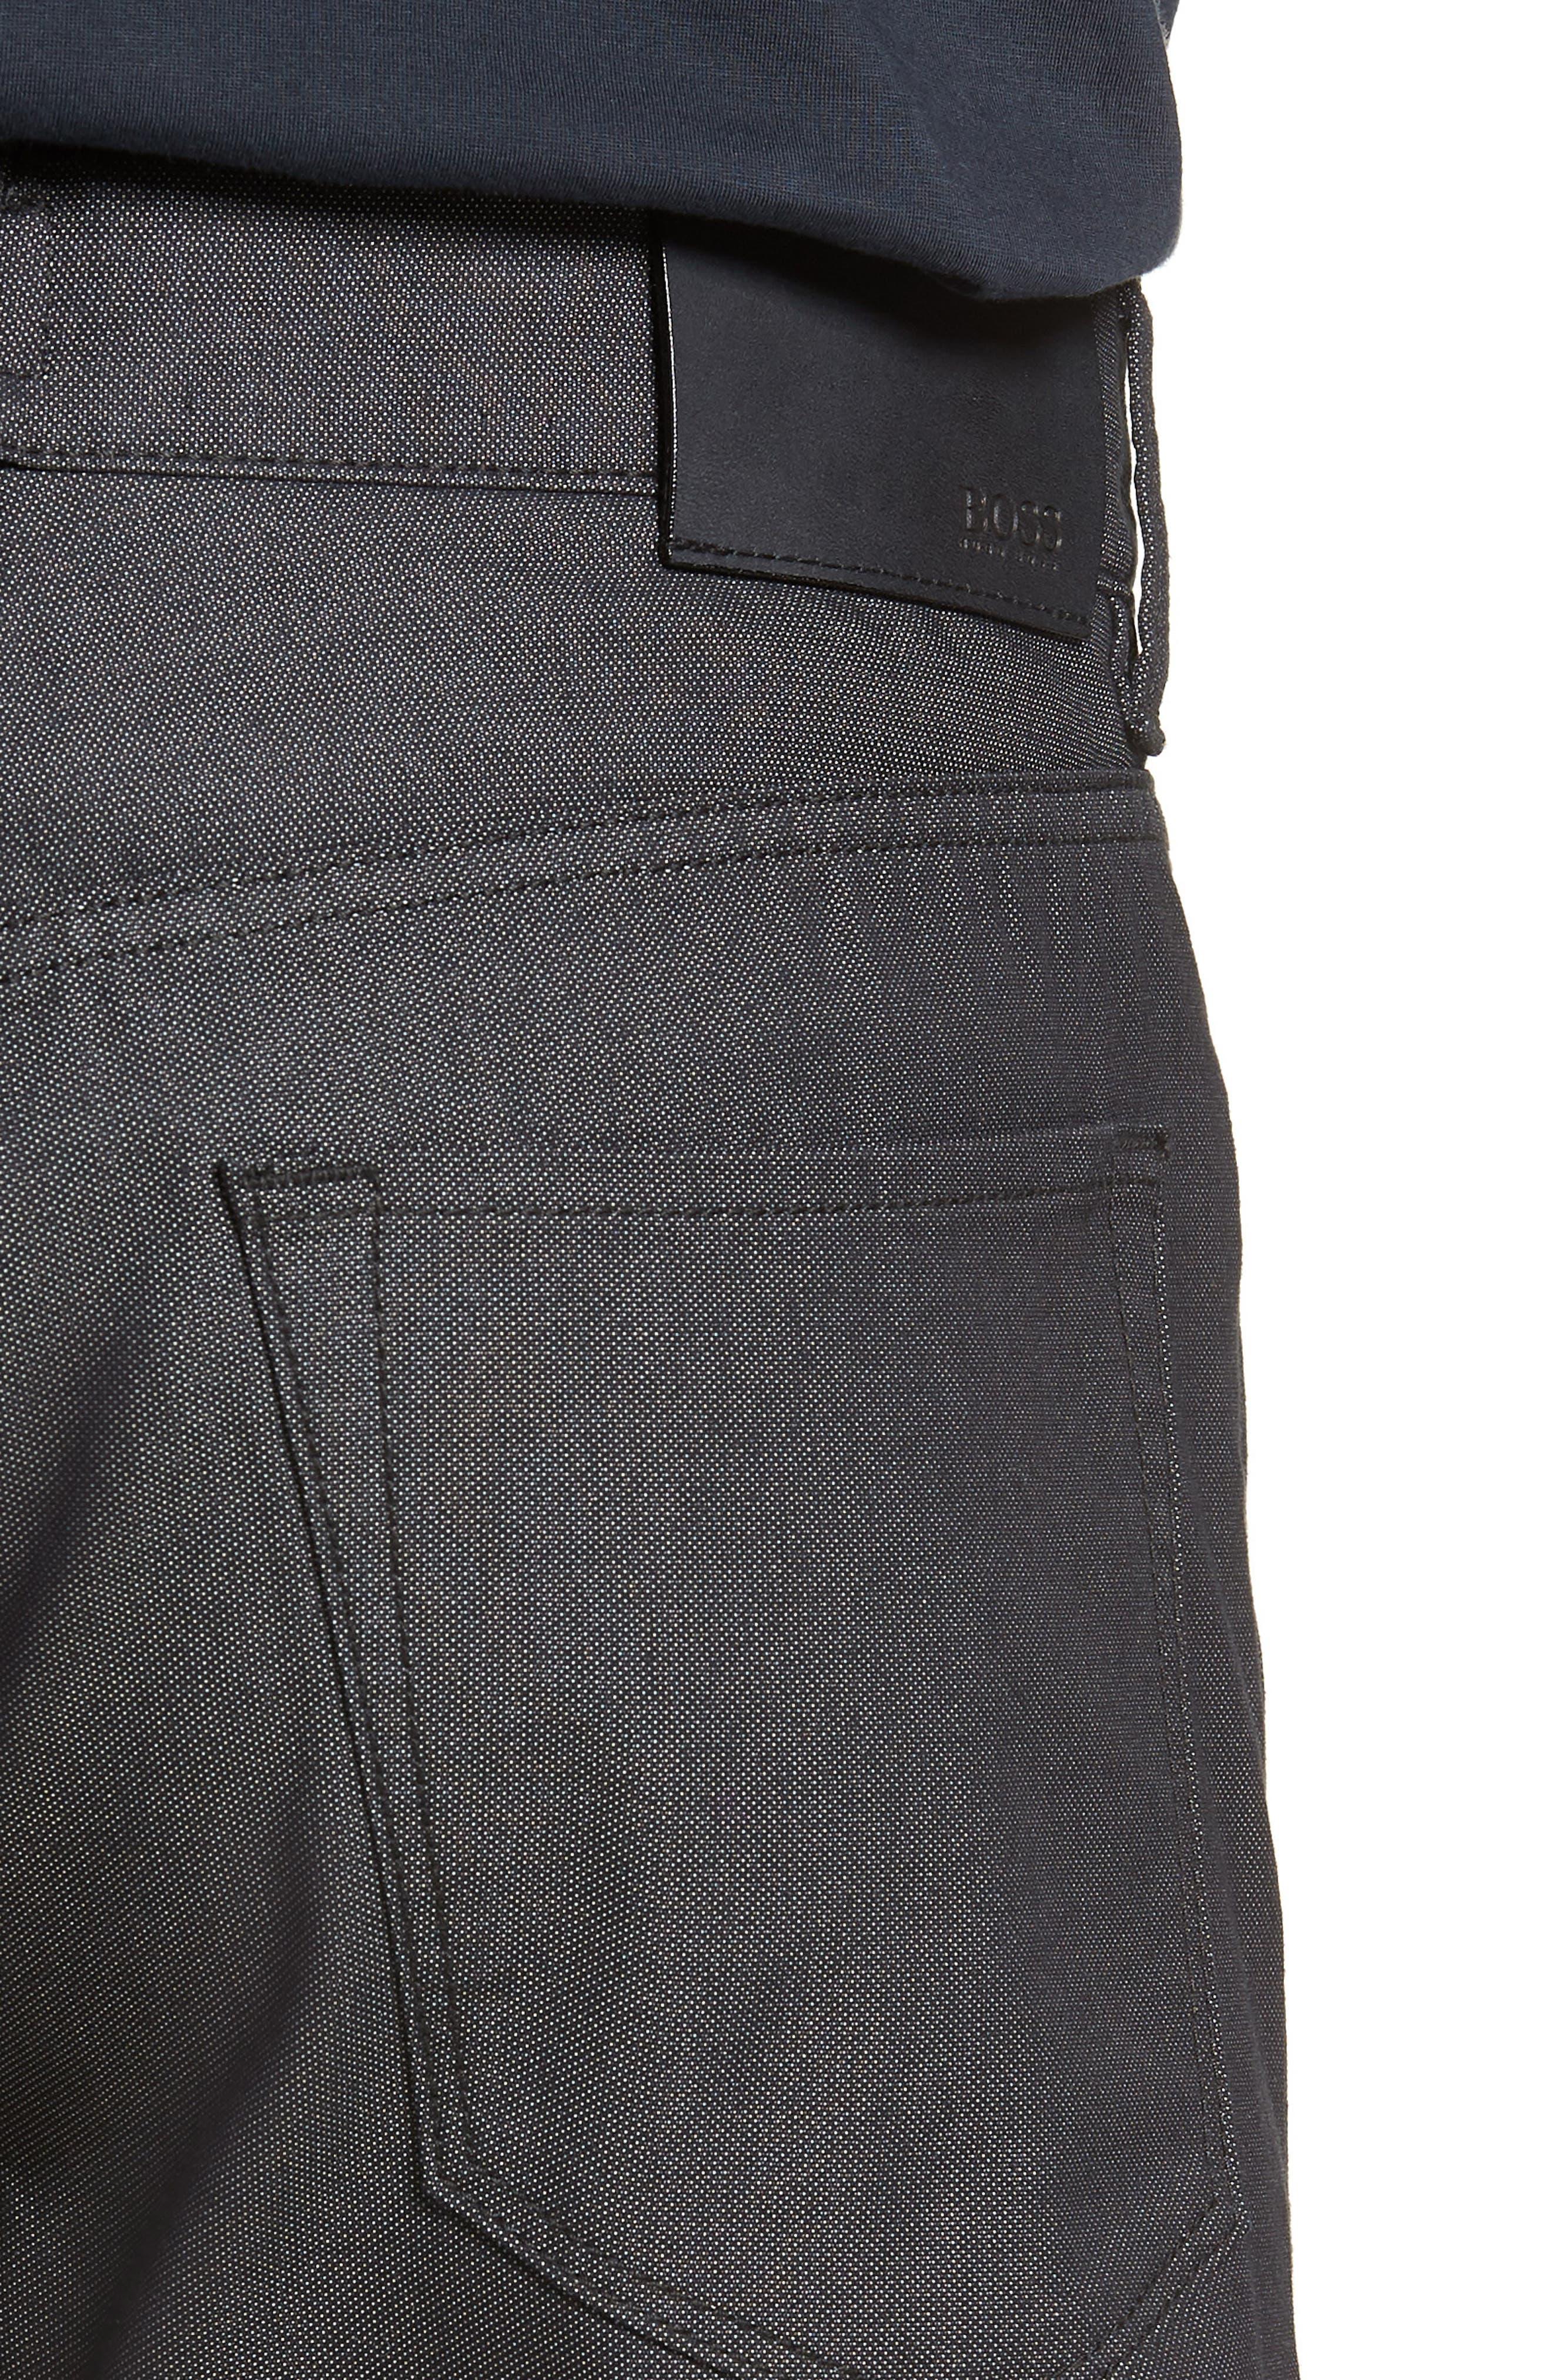 Maine Straight Leg Jeans,                             Alternate thumbnail 4, color,                             Black